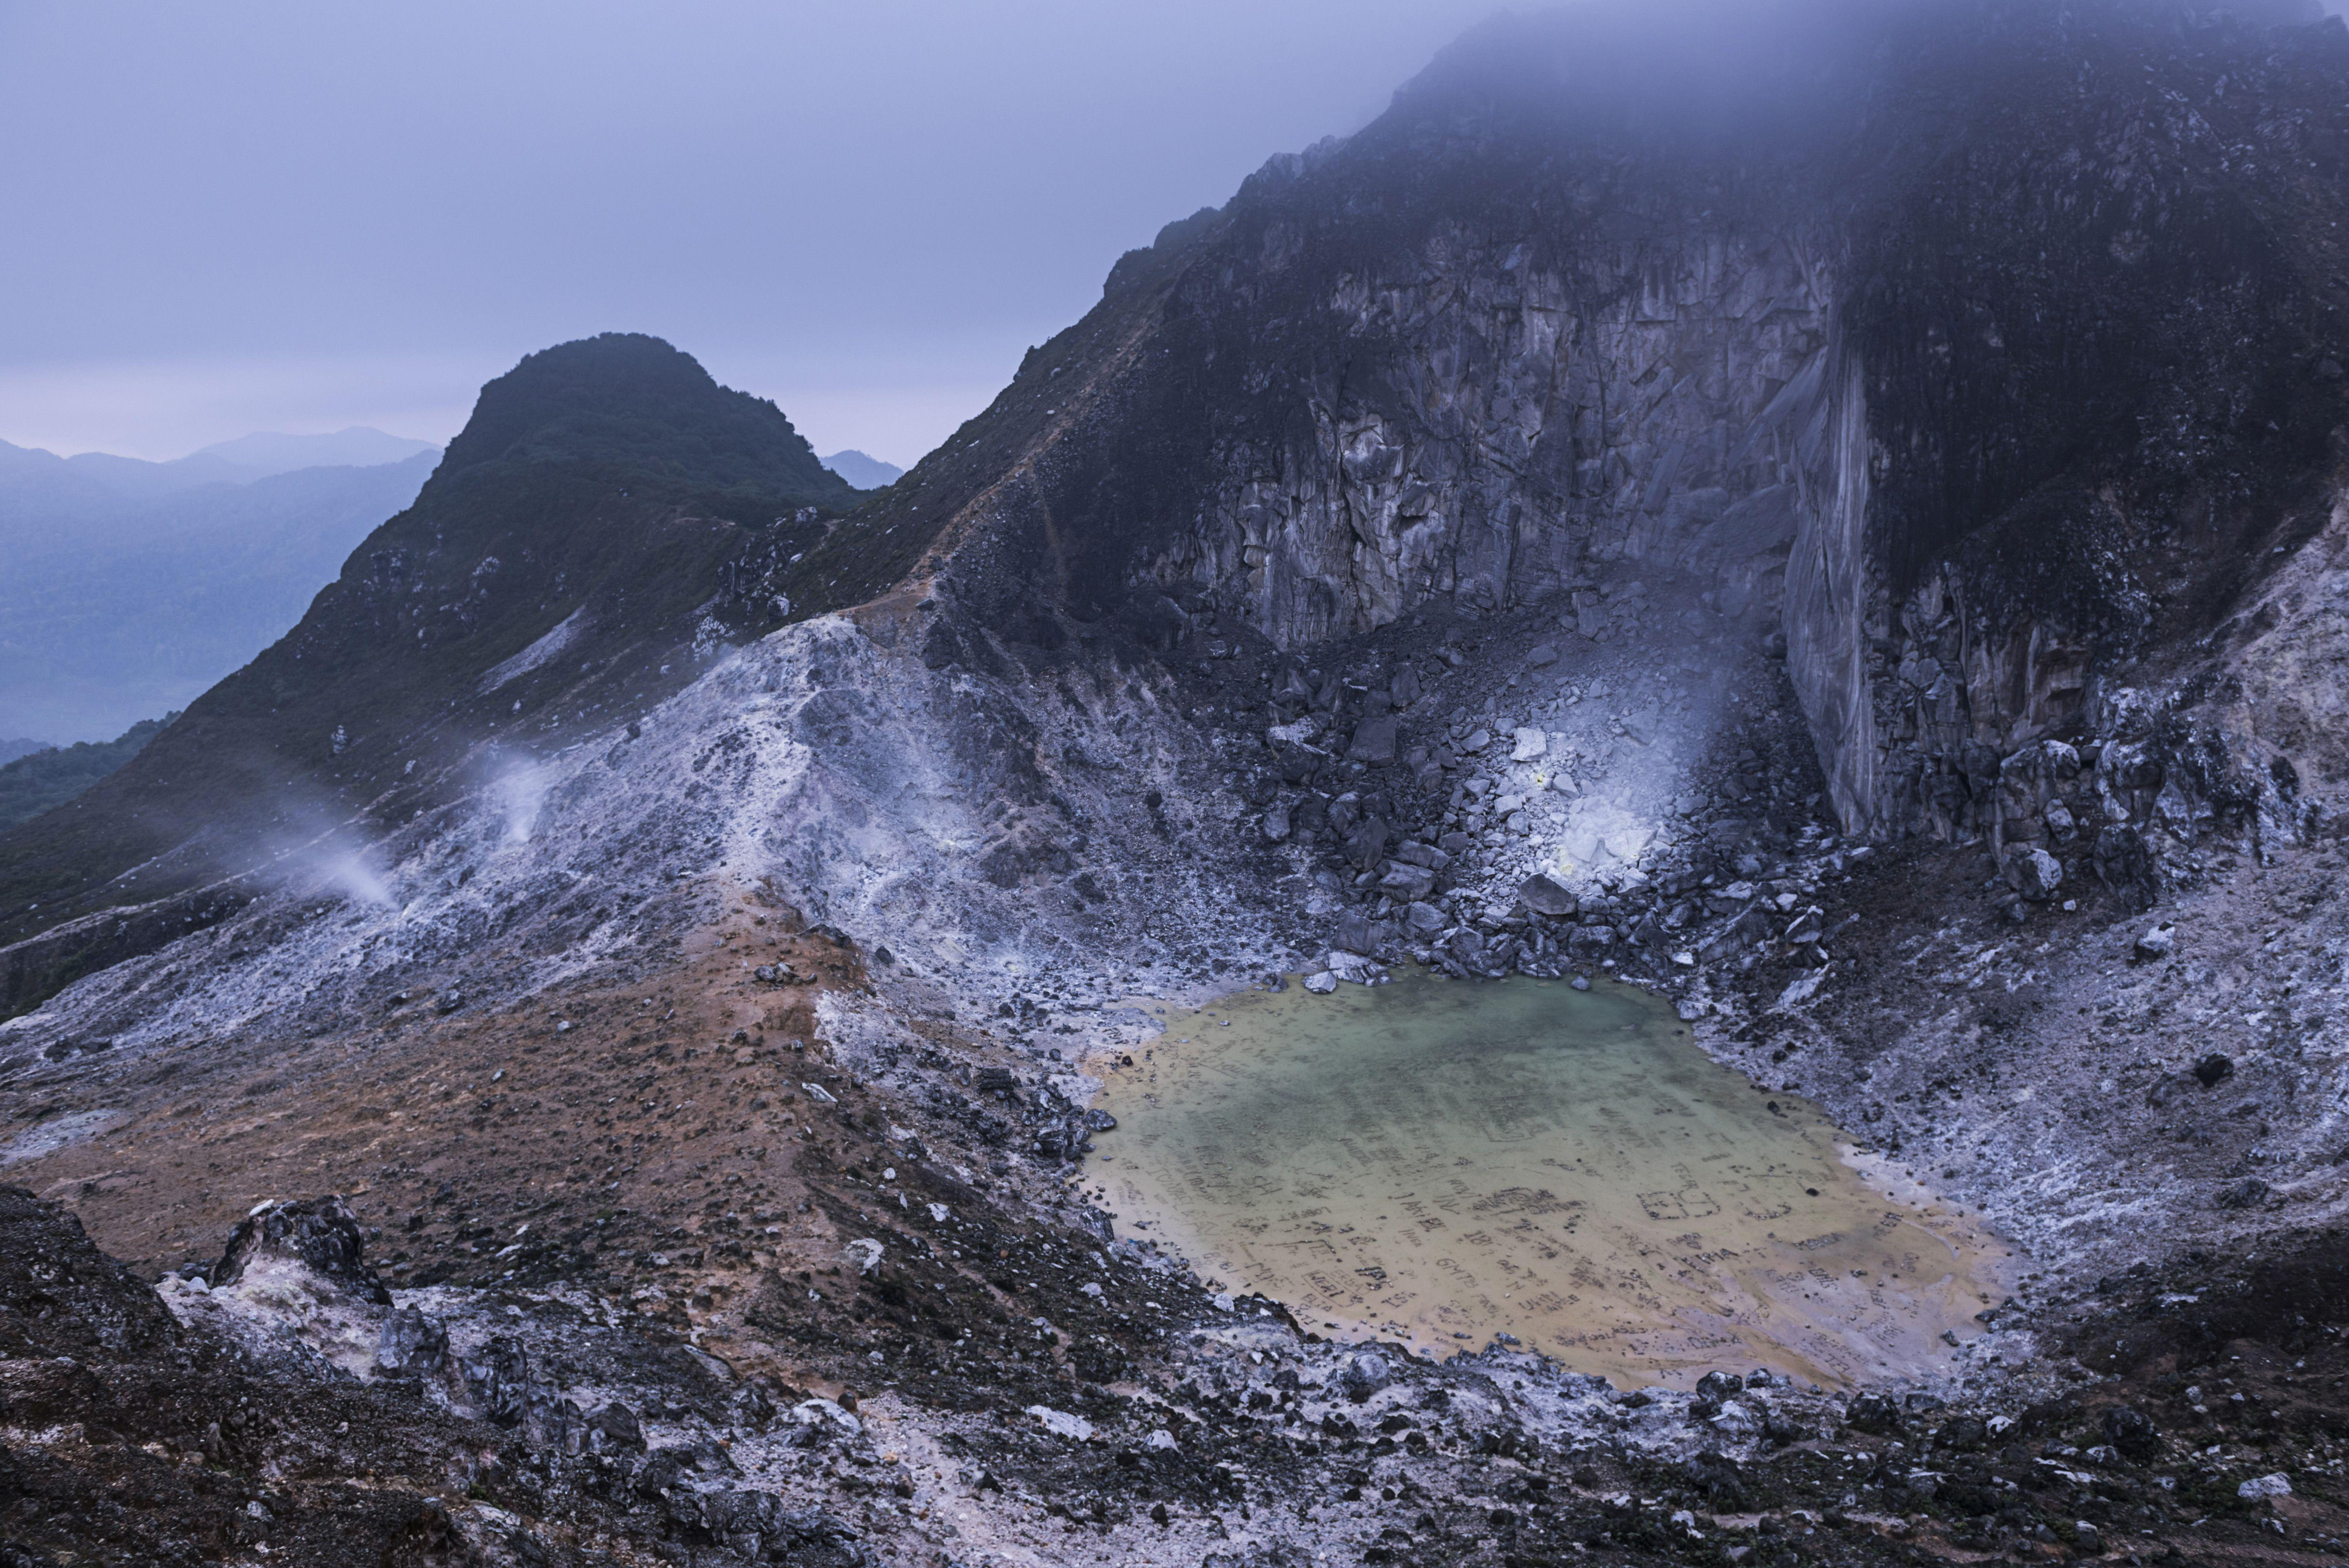 Gunung Sibayak North Sumatra Indonesia